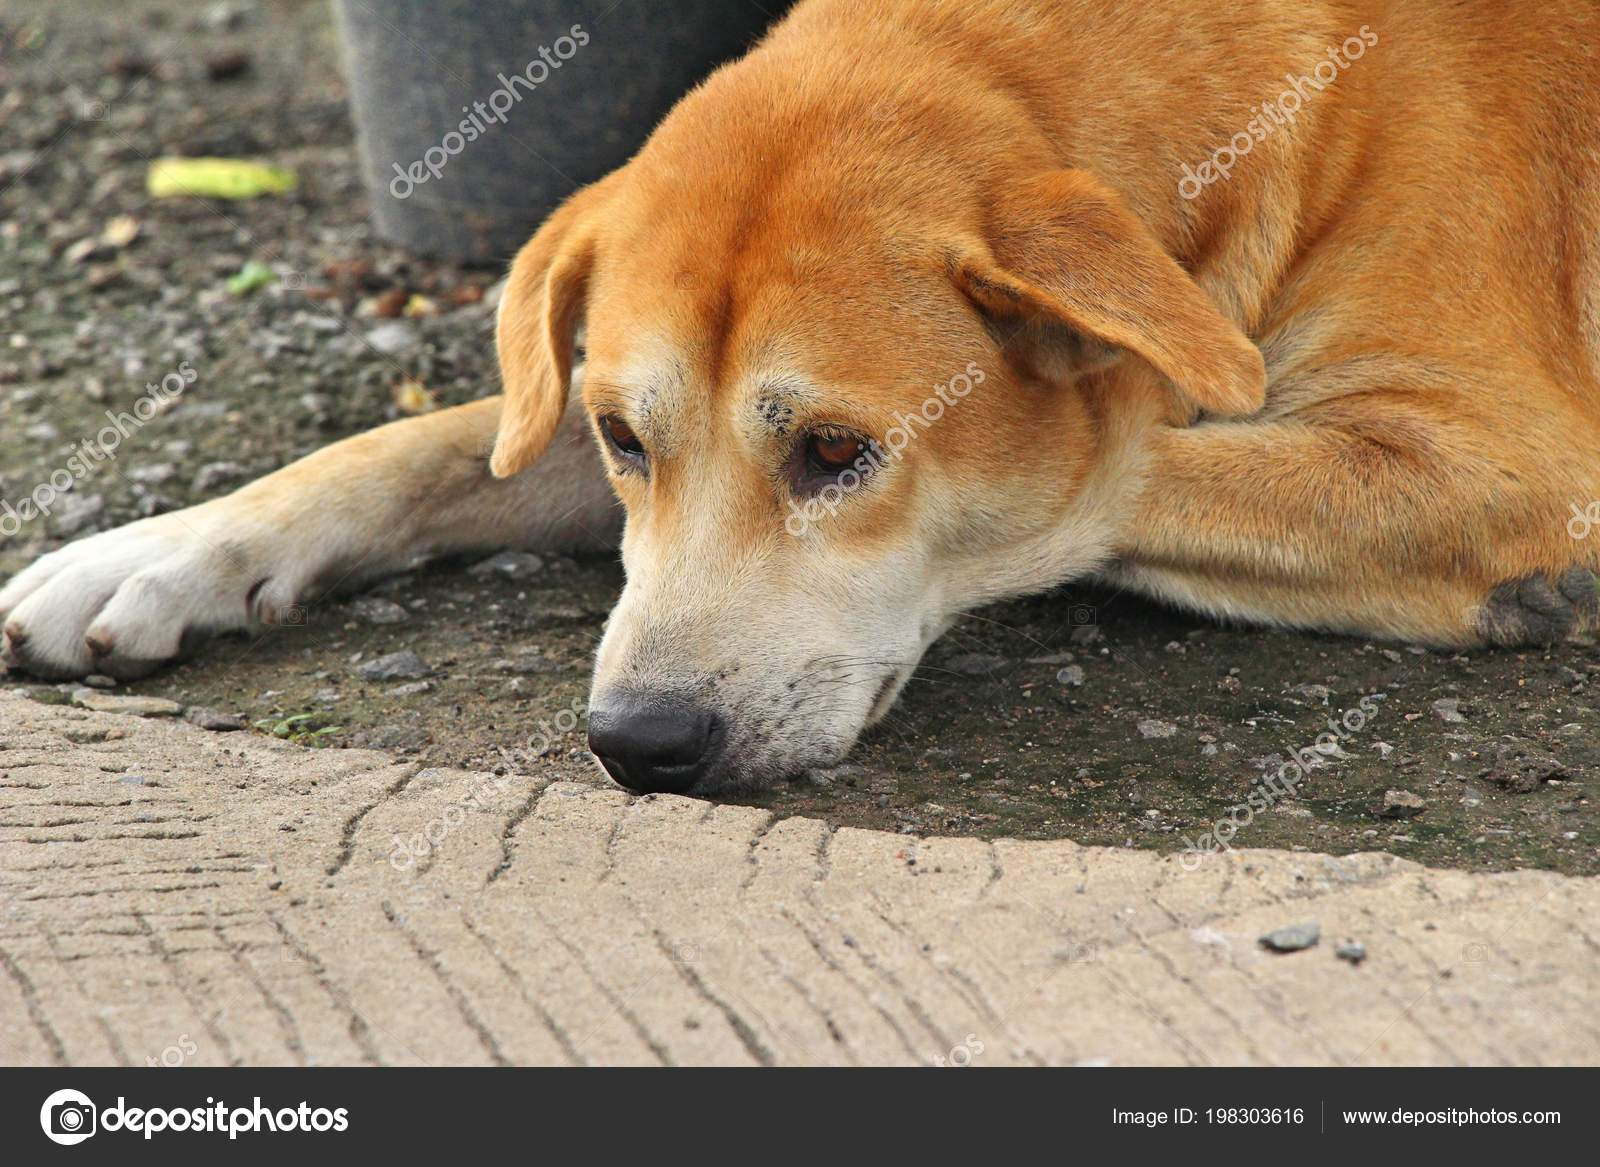 Slapen Op Grond : Bruine hond leuk slapen grond u2014 stockfoto © seagamess #198303616